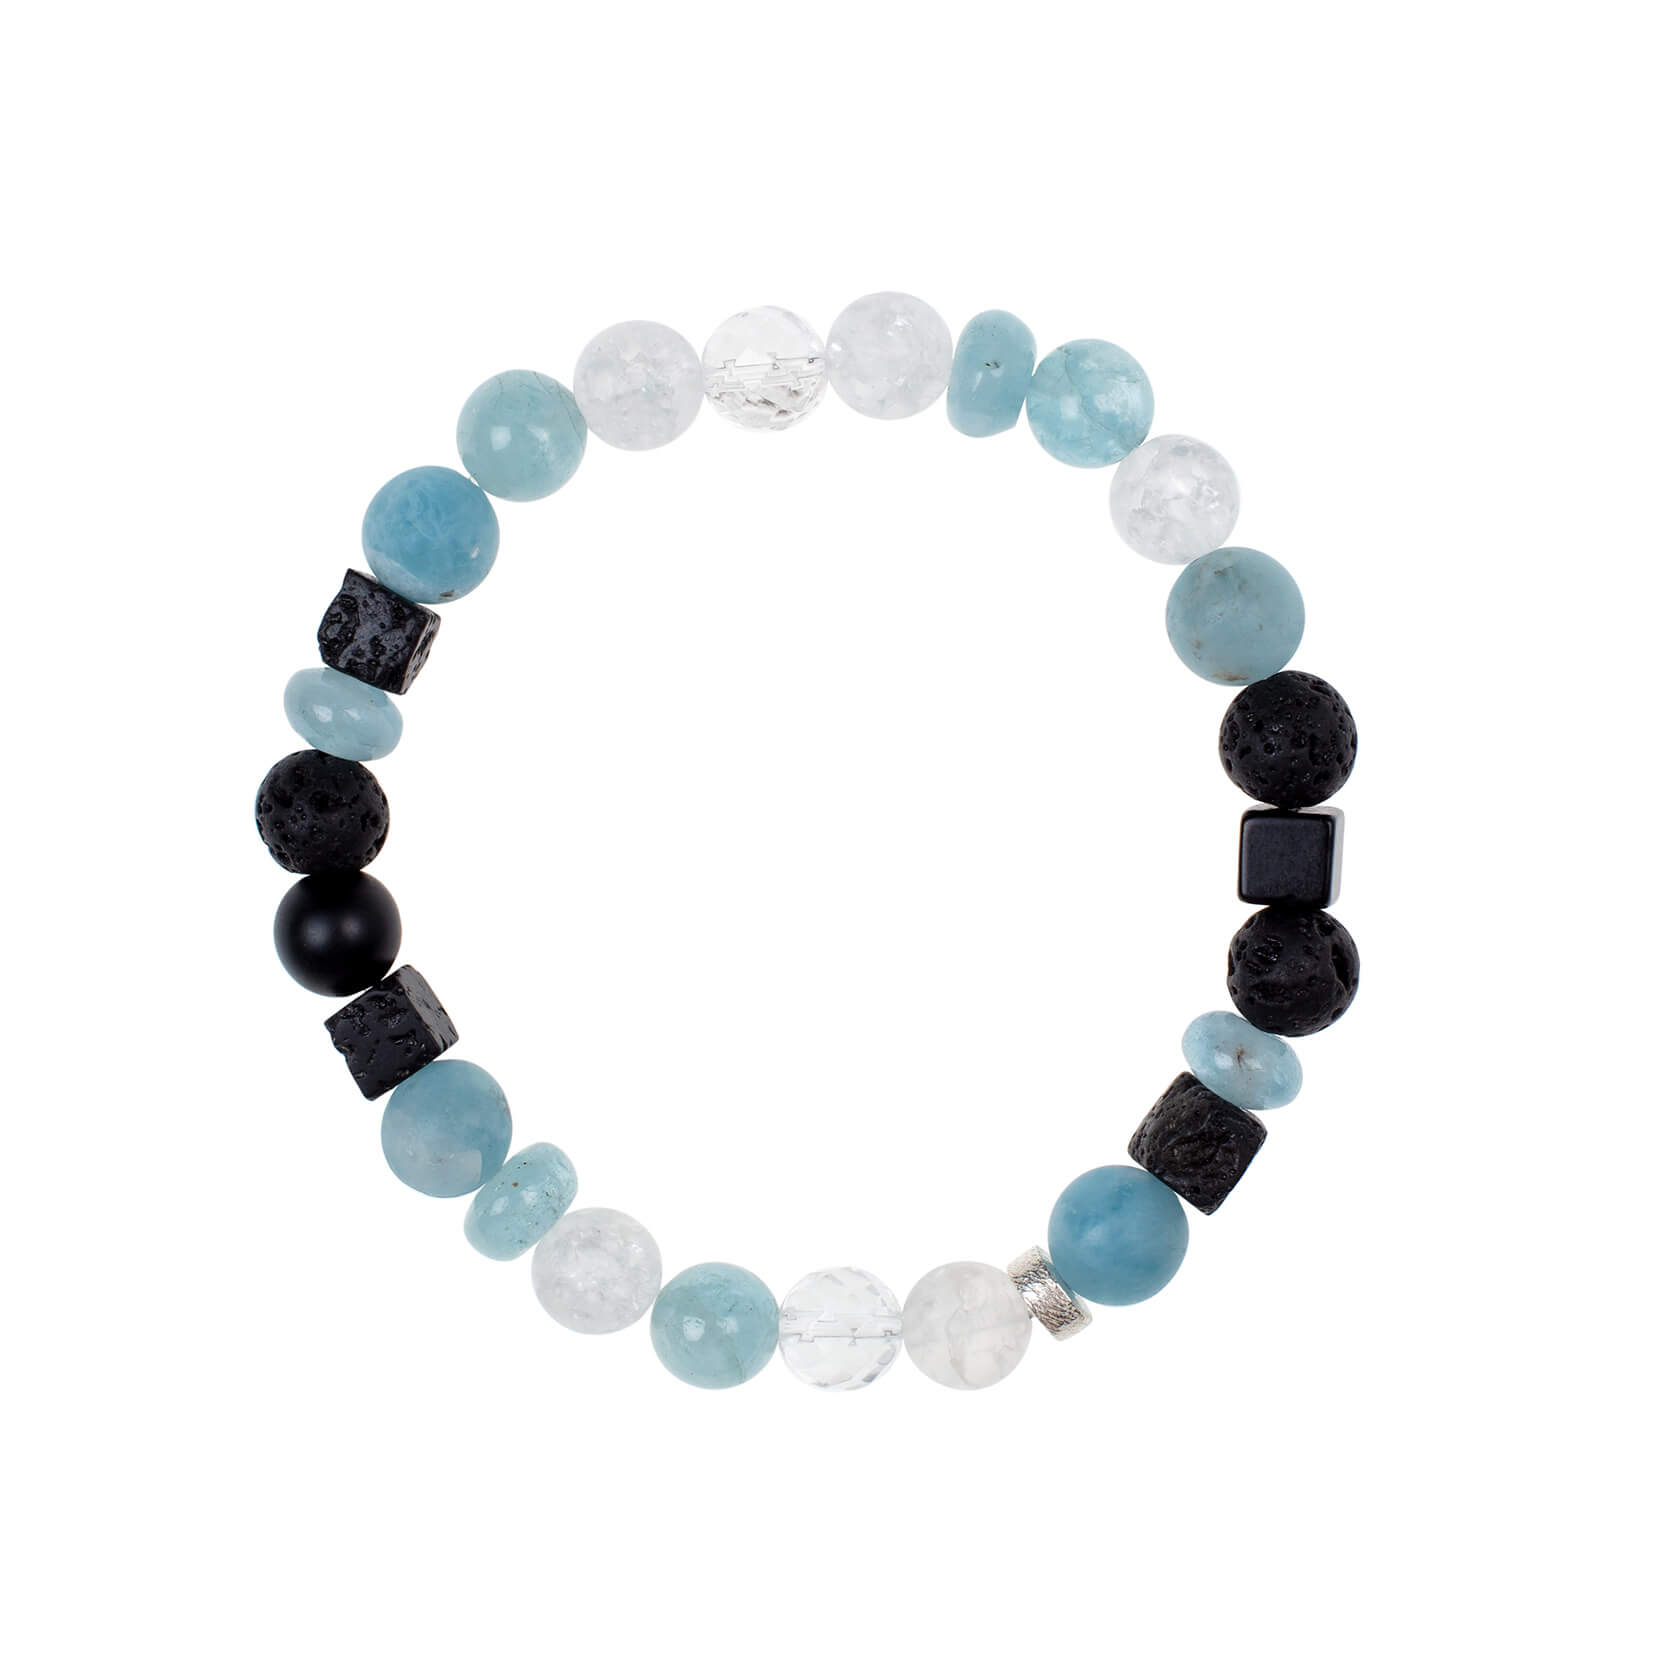 Aquamarine unisex bracelet